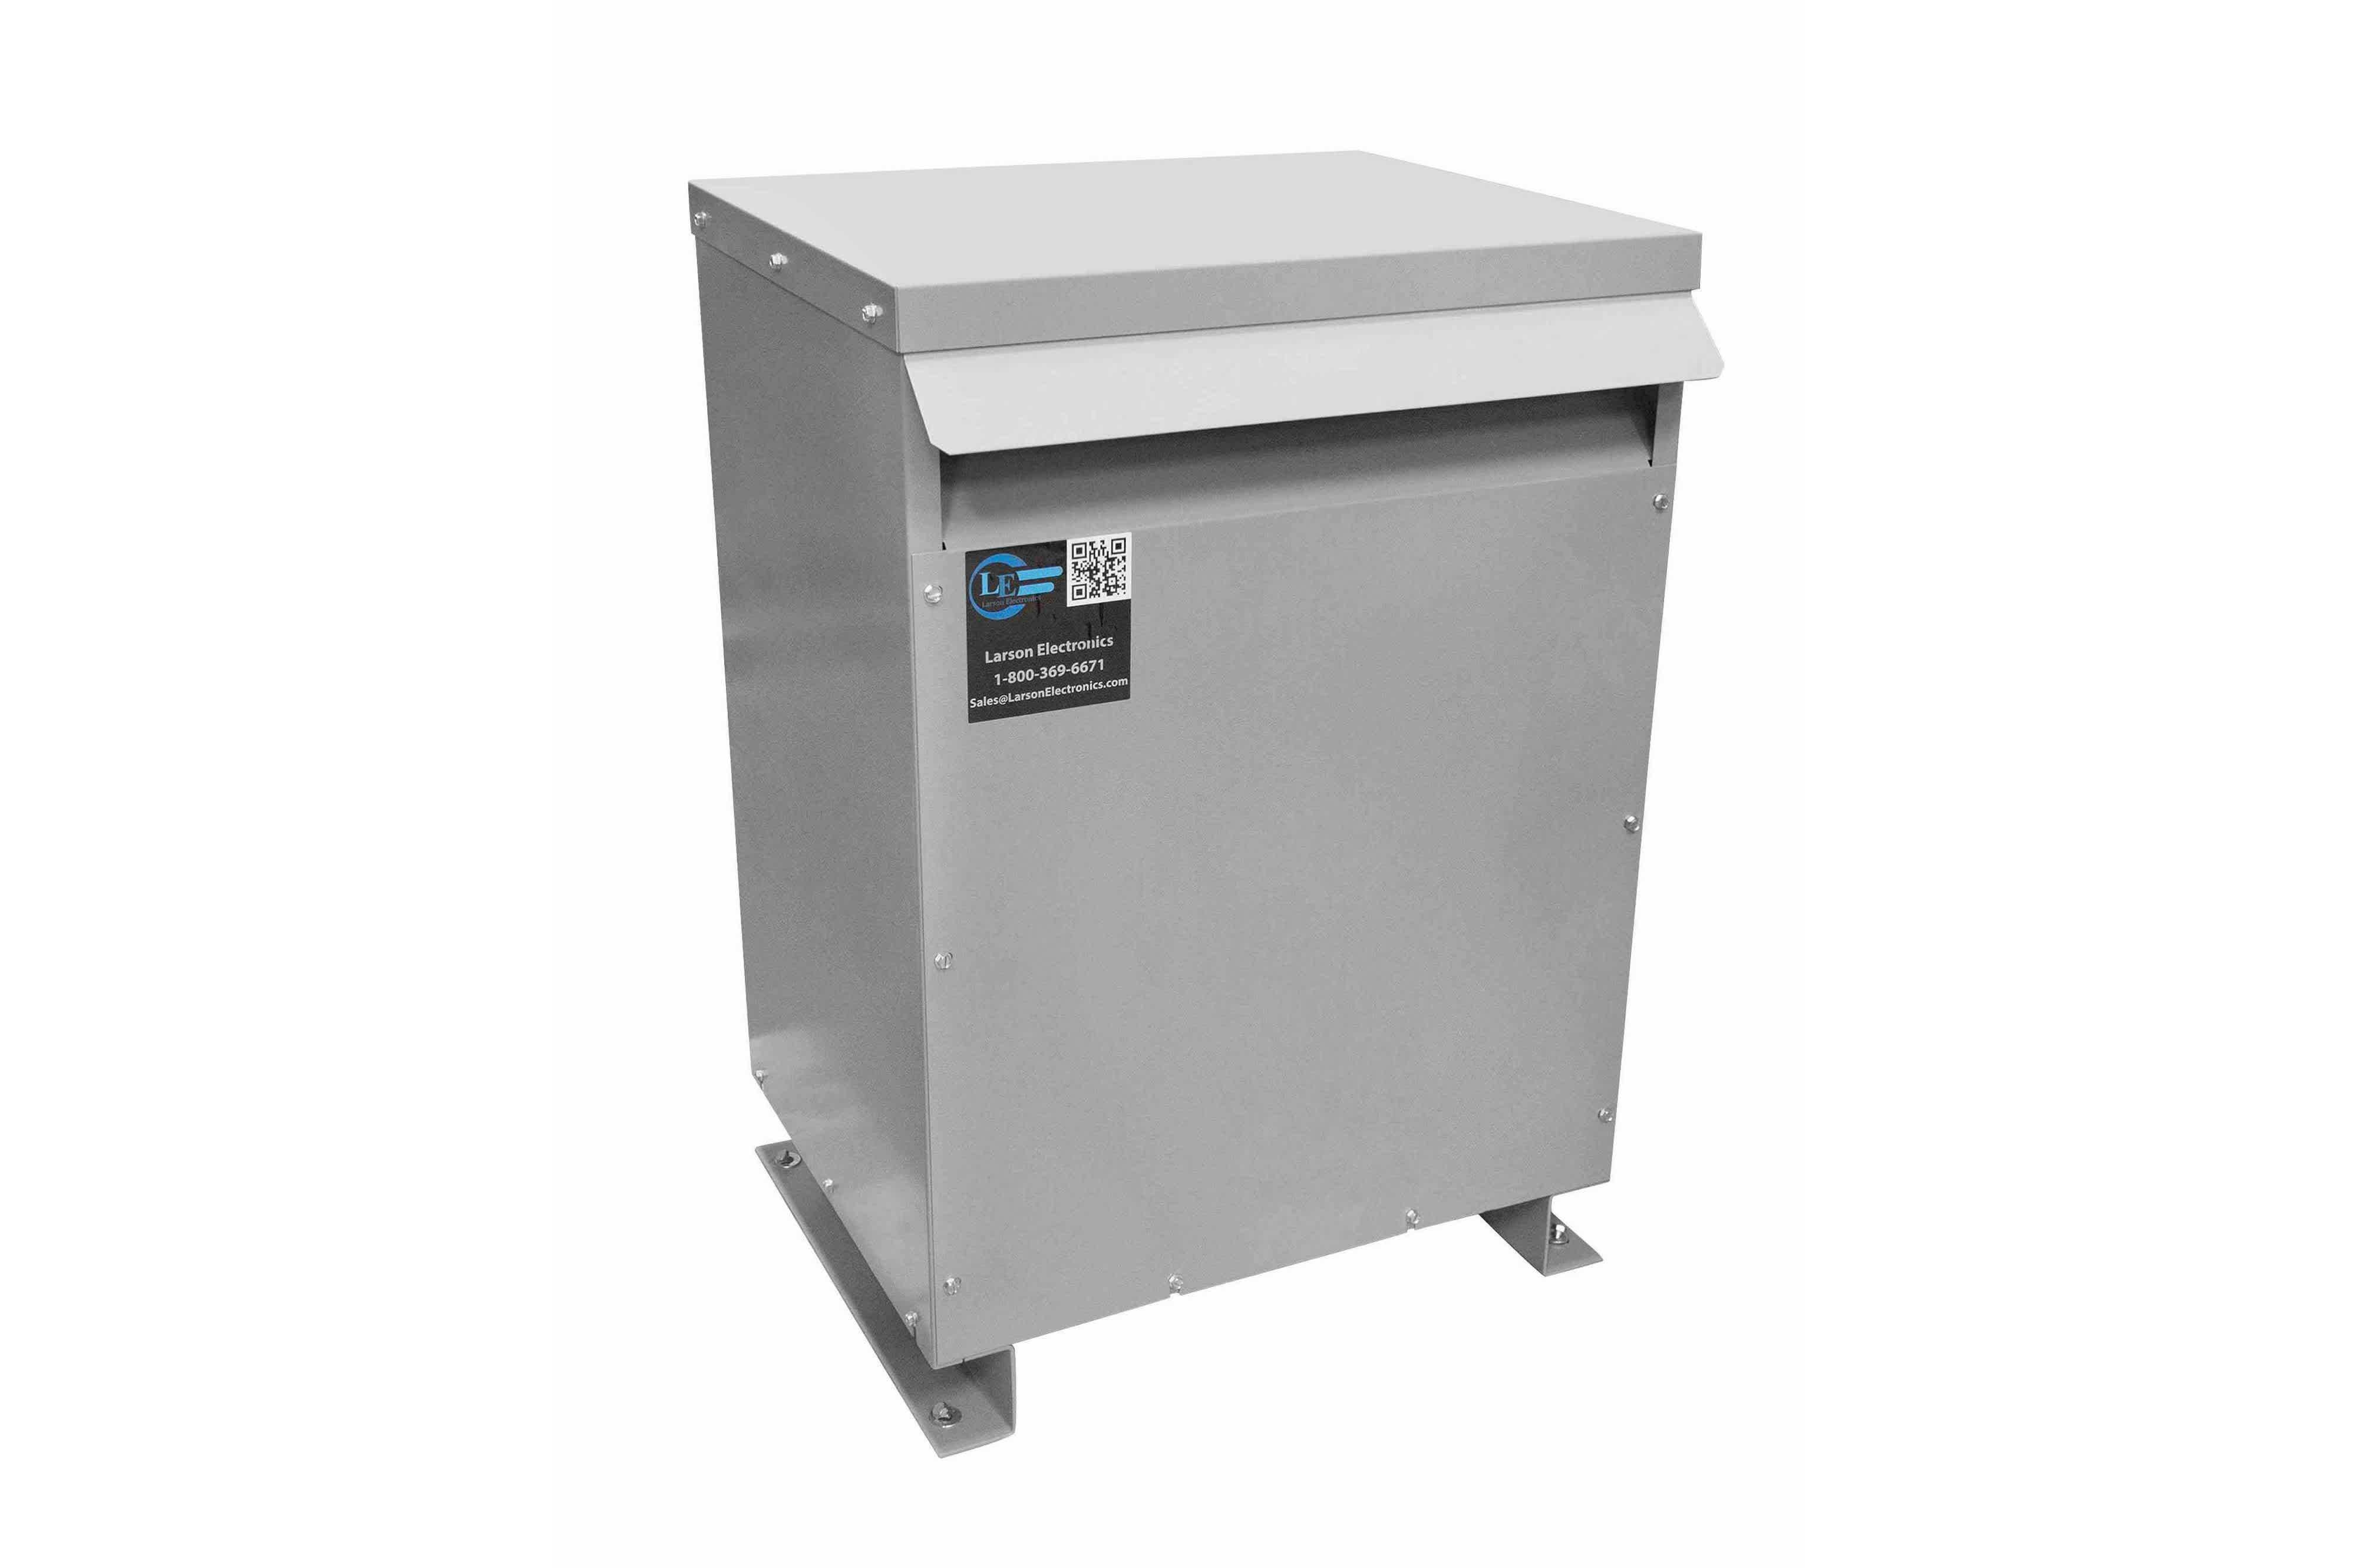 225 kVA 3PH Isolation Transformer, 600V Wye Primary, 240V Delta Secondary, N3R, Ventilated, 60 Hz